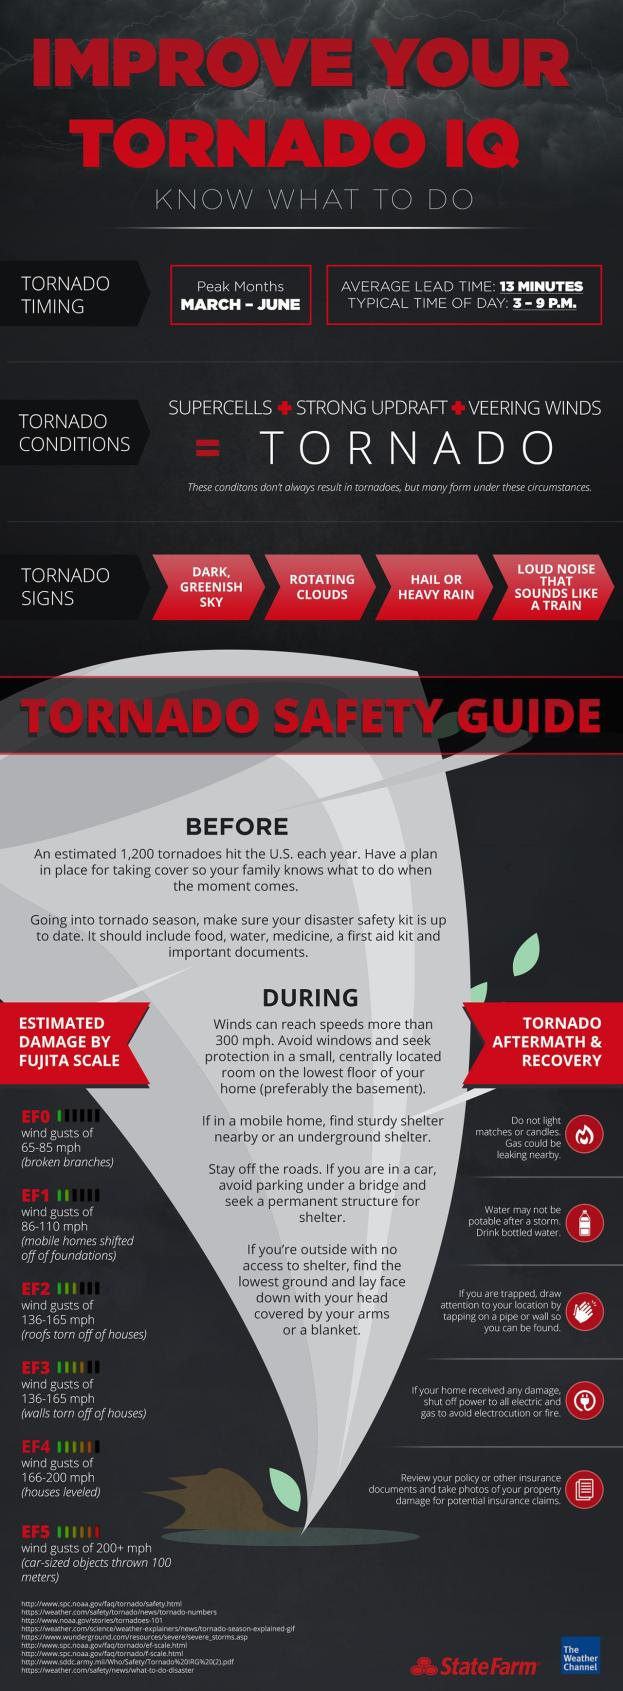 Tornado Information